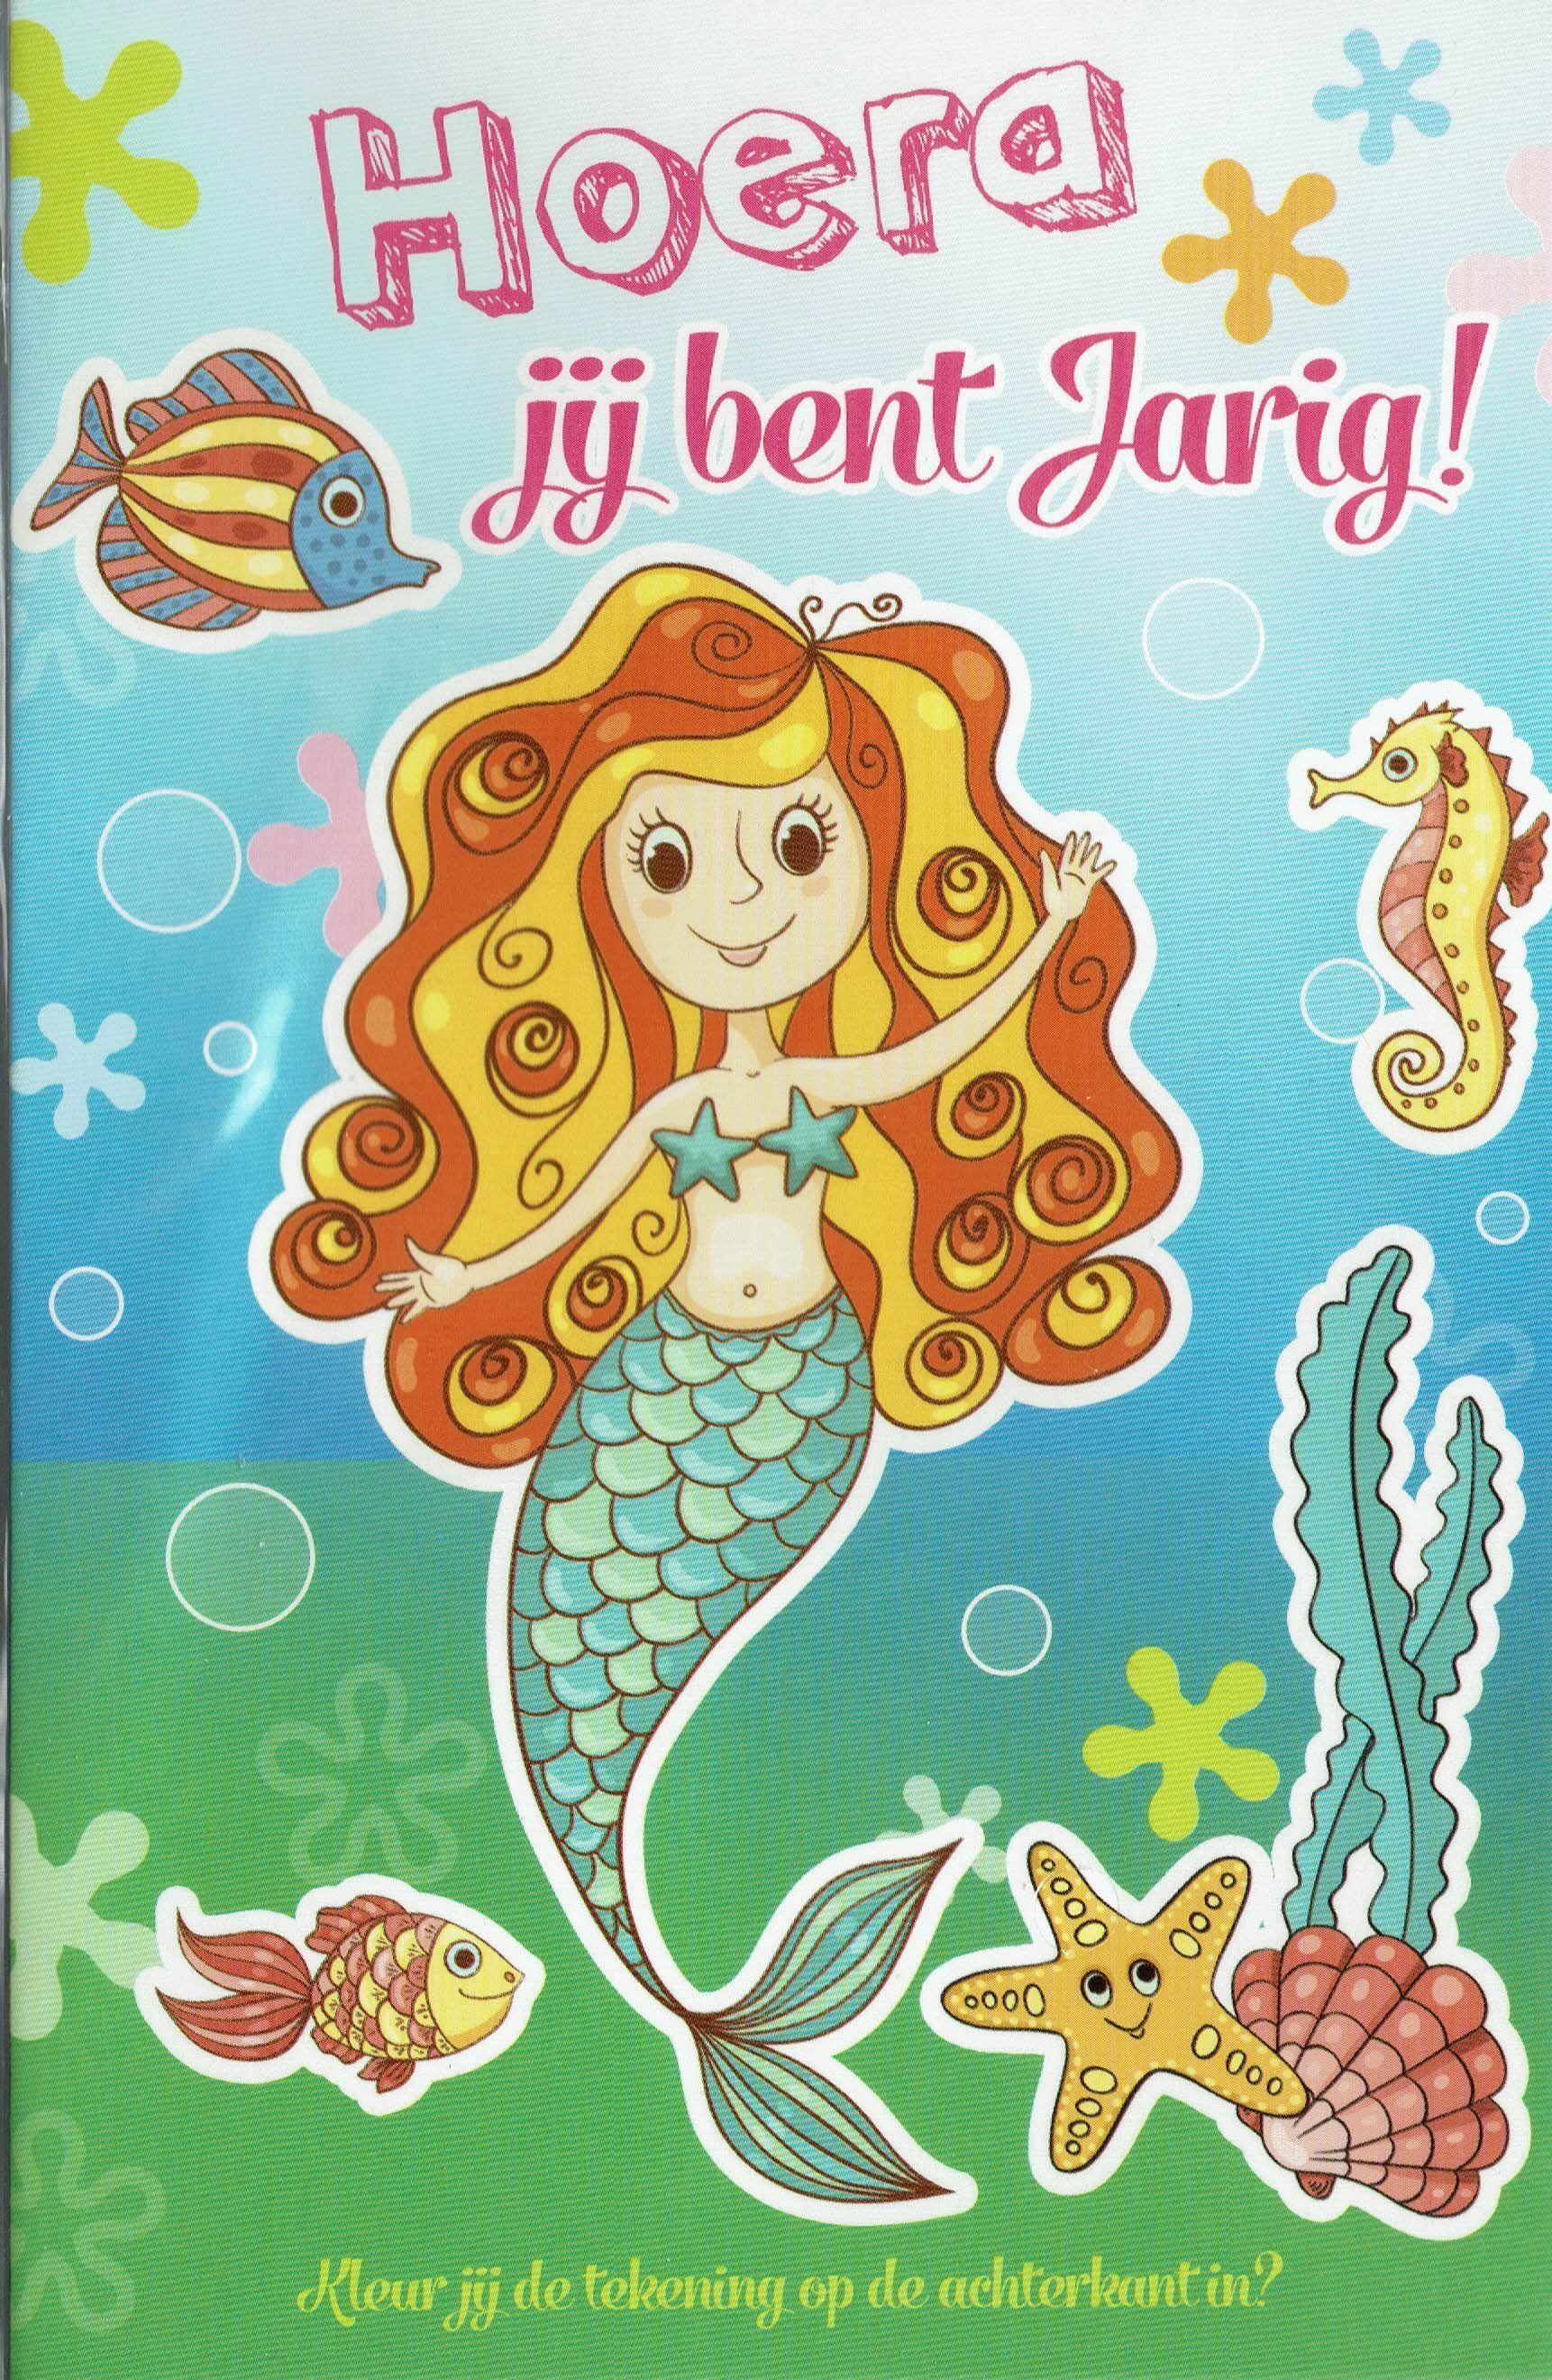 Afbeeldingsresultaat voor Verjaardagskaart kleuter prinses